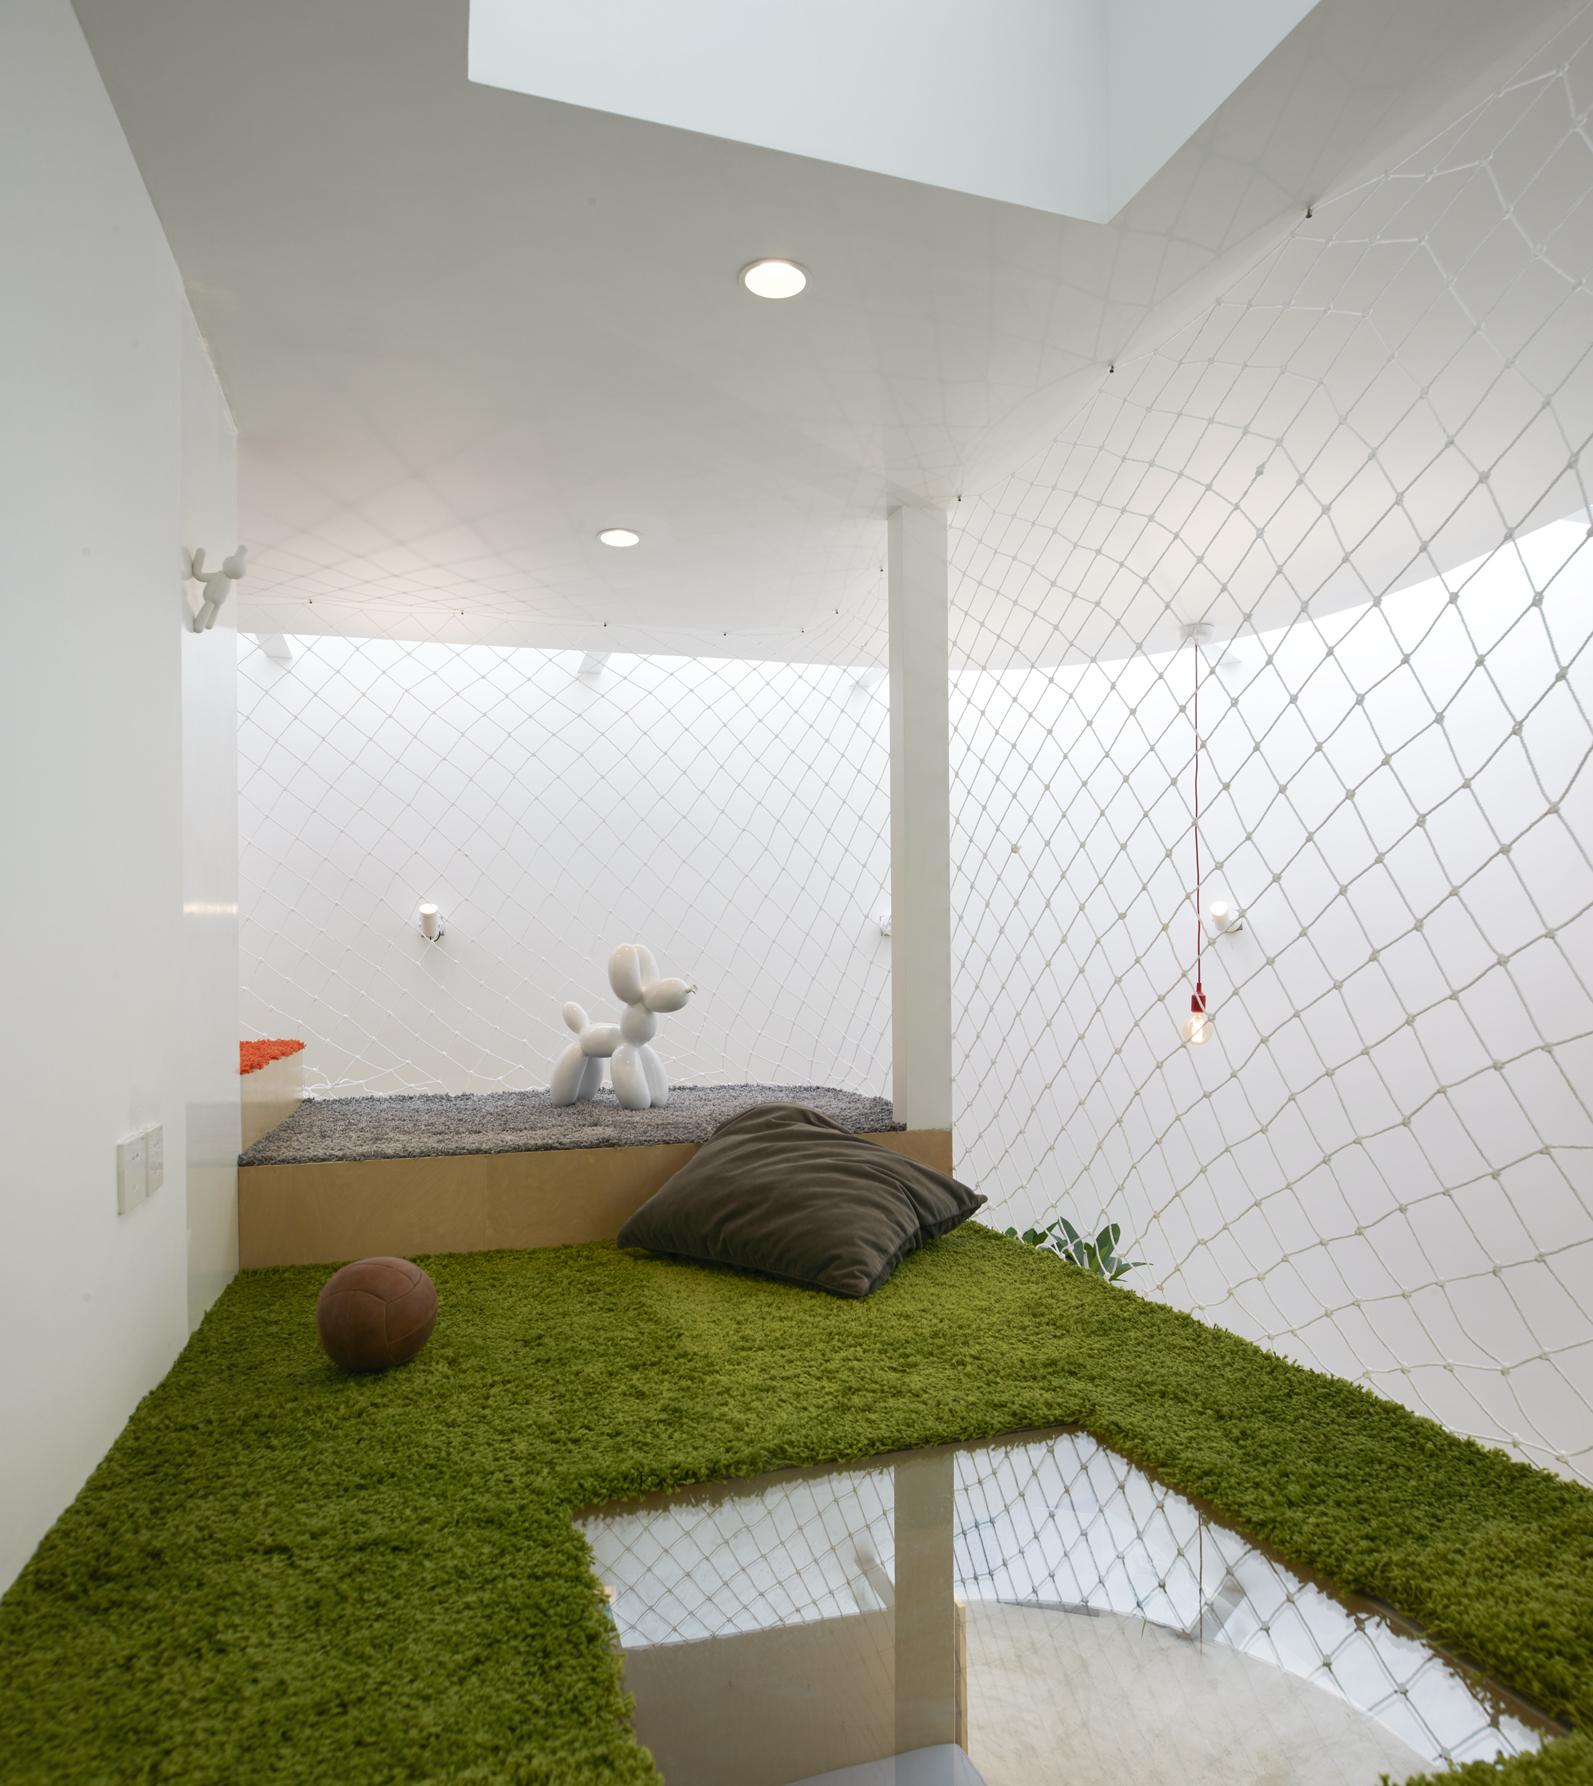 Gallery Of Dengshikou Hutong Residence / B.L.U.E